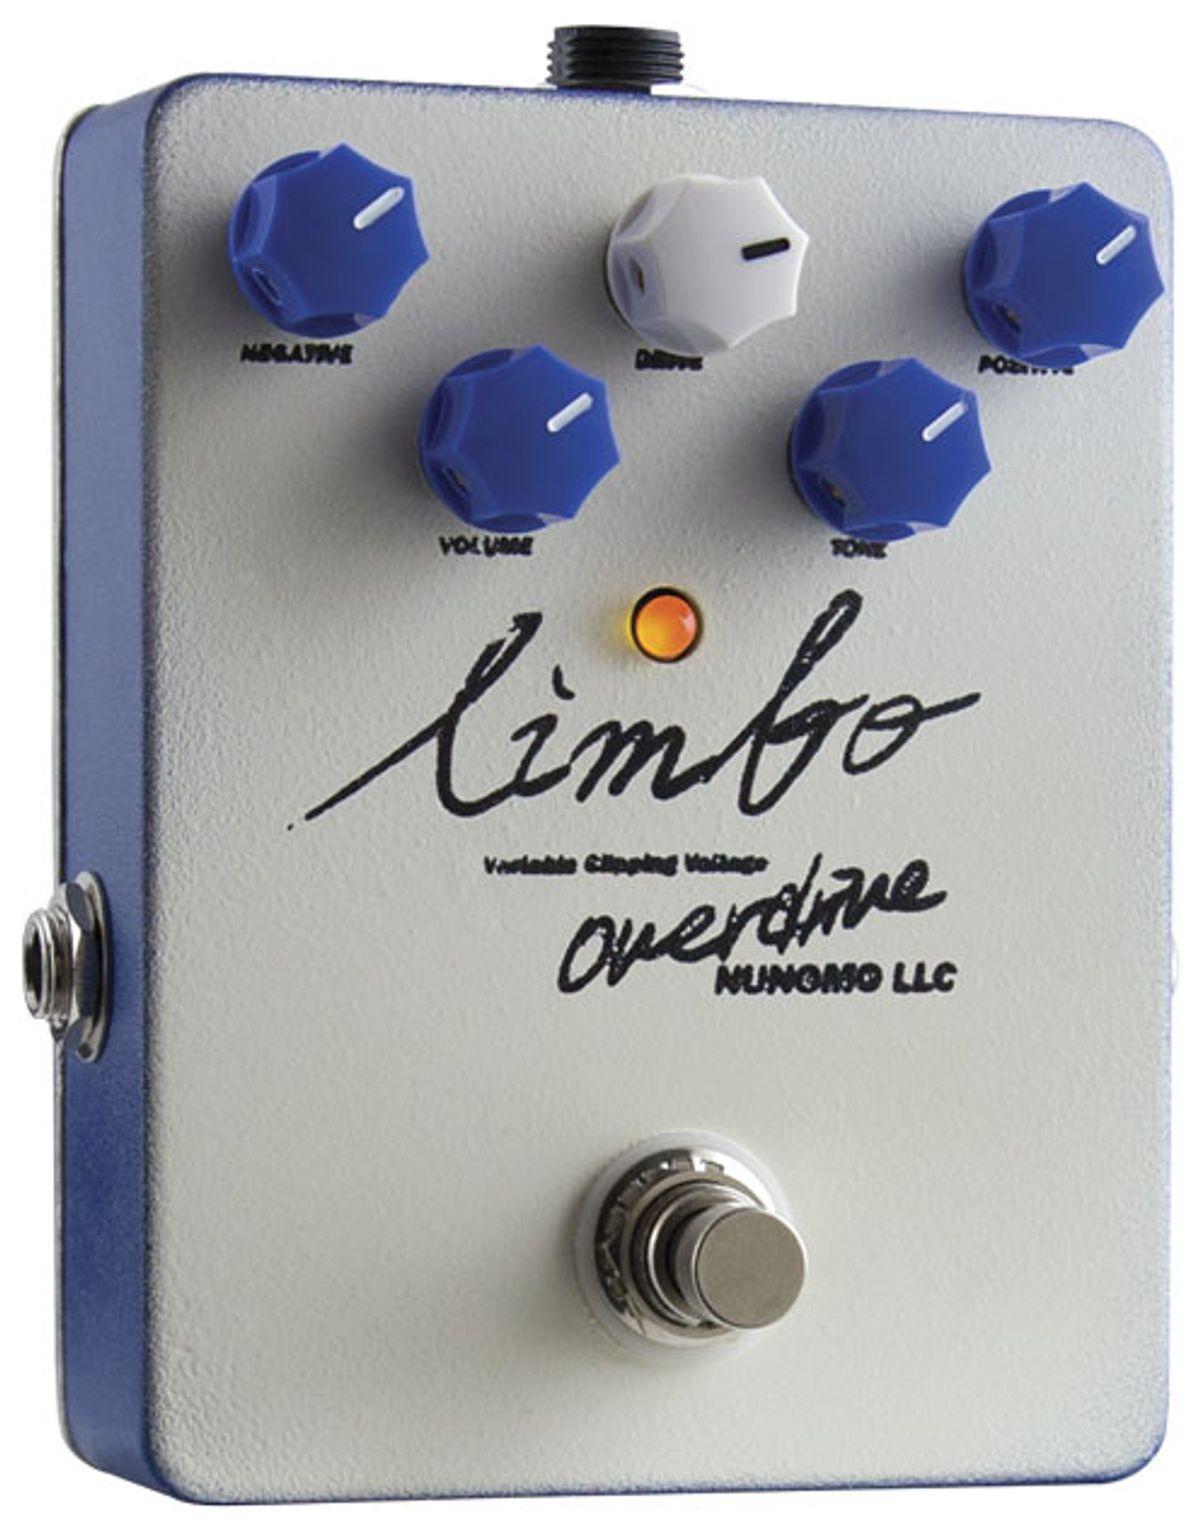 Nunomo Limbo Overdrive Review